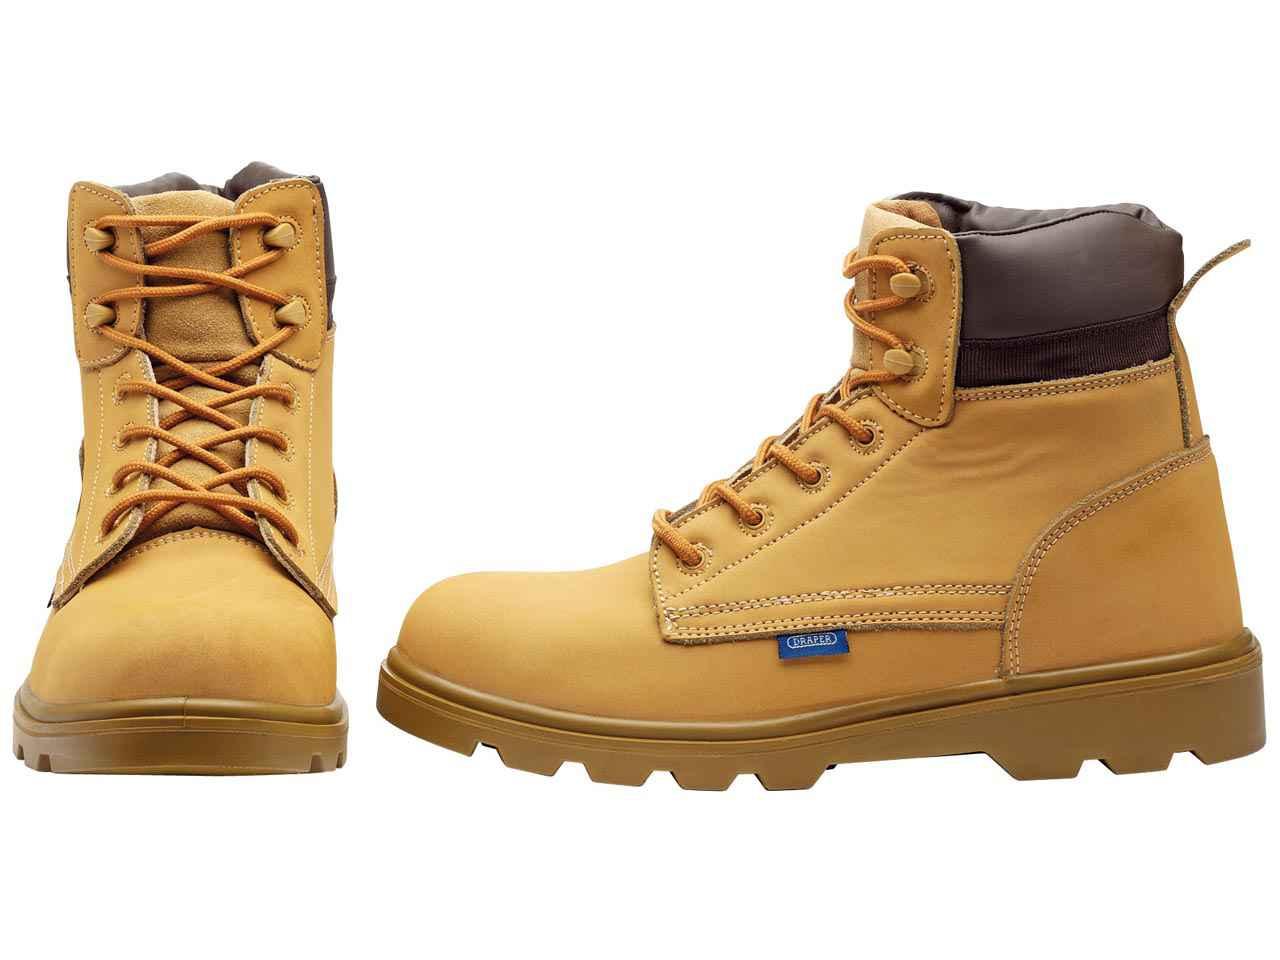 9147228d85b Draper Nubuck Style Honey Safety Boots Various Sizes